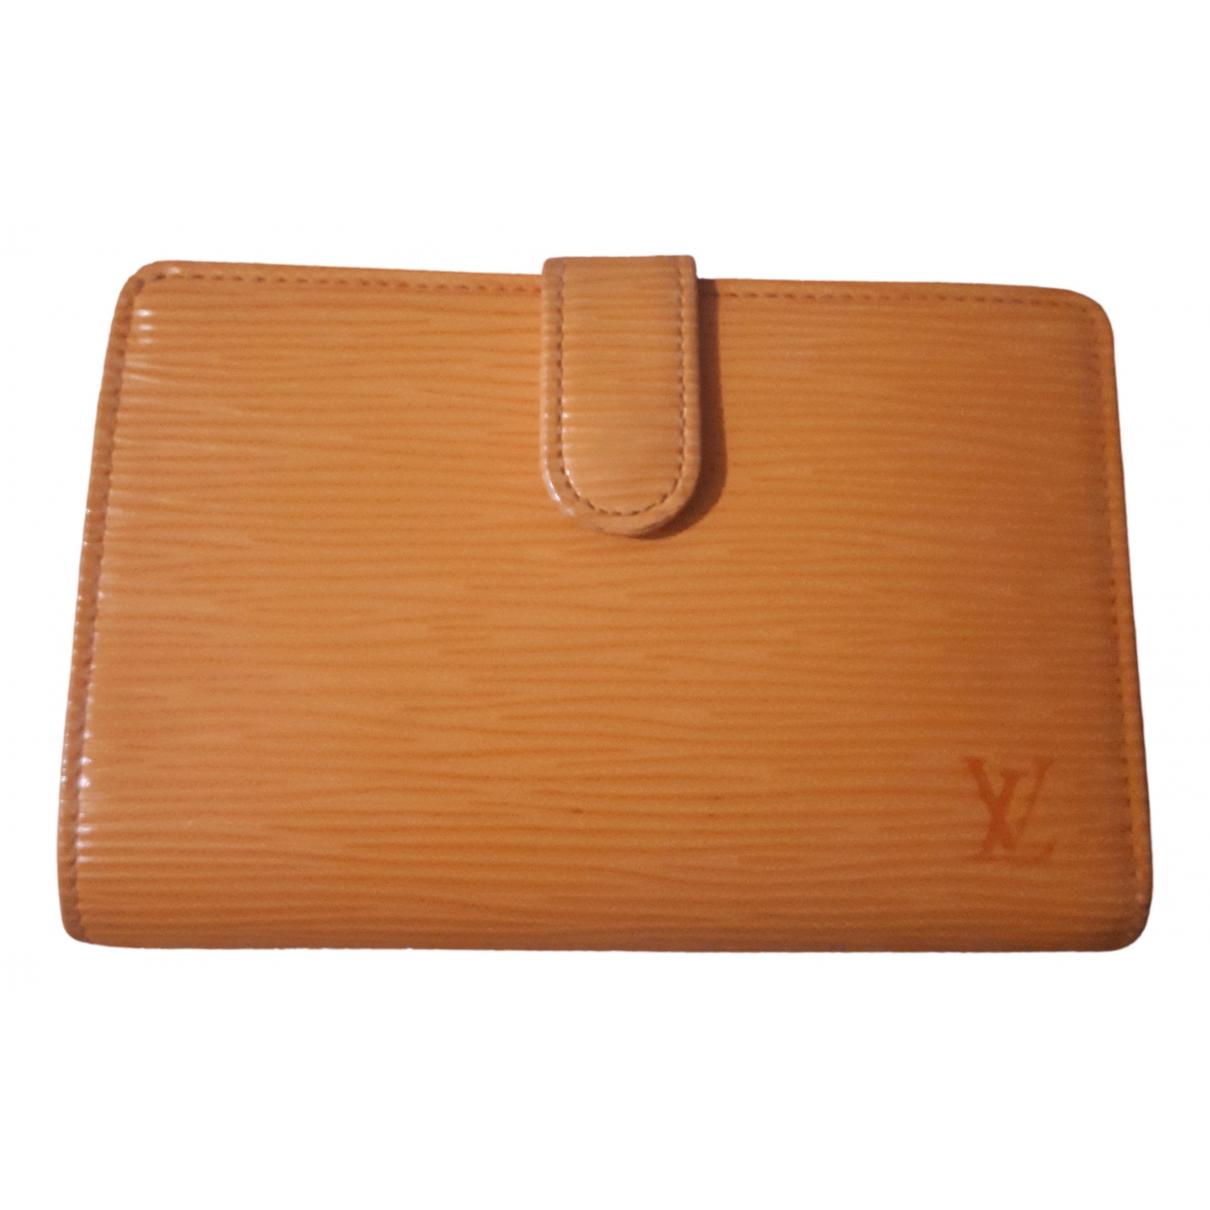 Louis Vuitton N Orange Leather Purses, wallet & cases for Women N